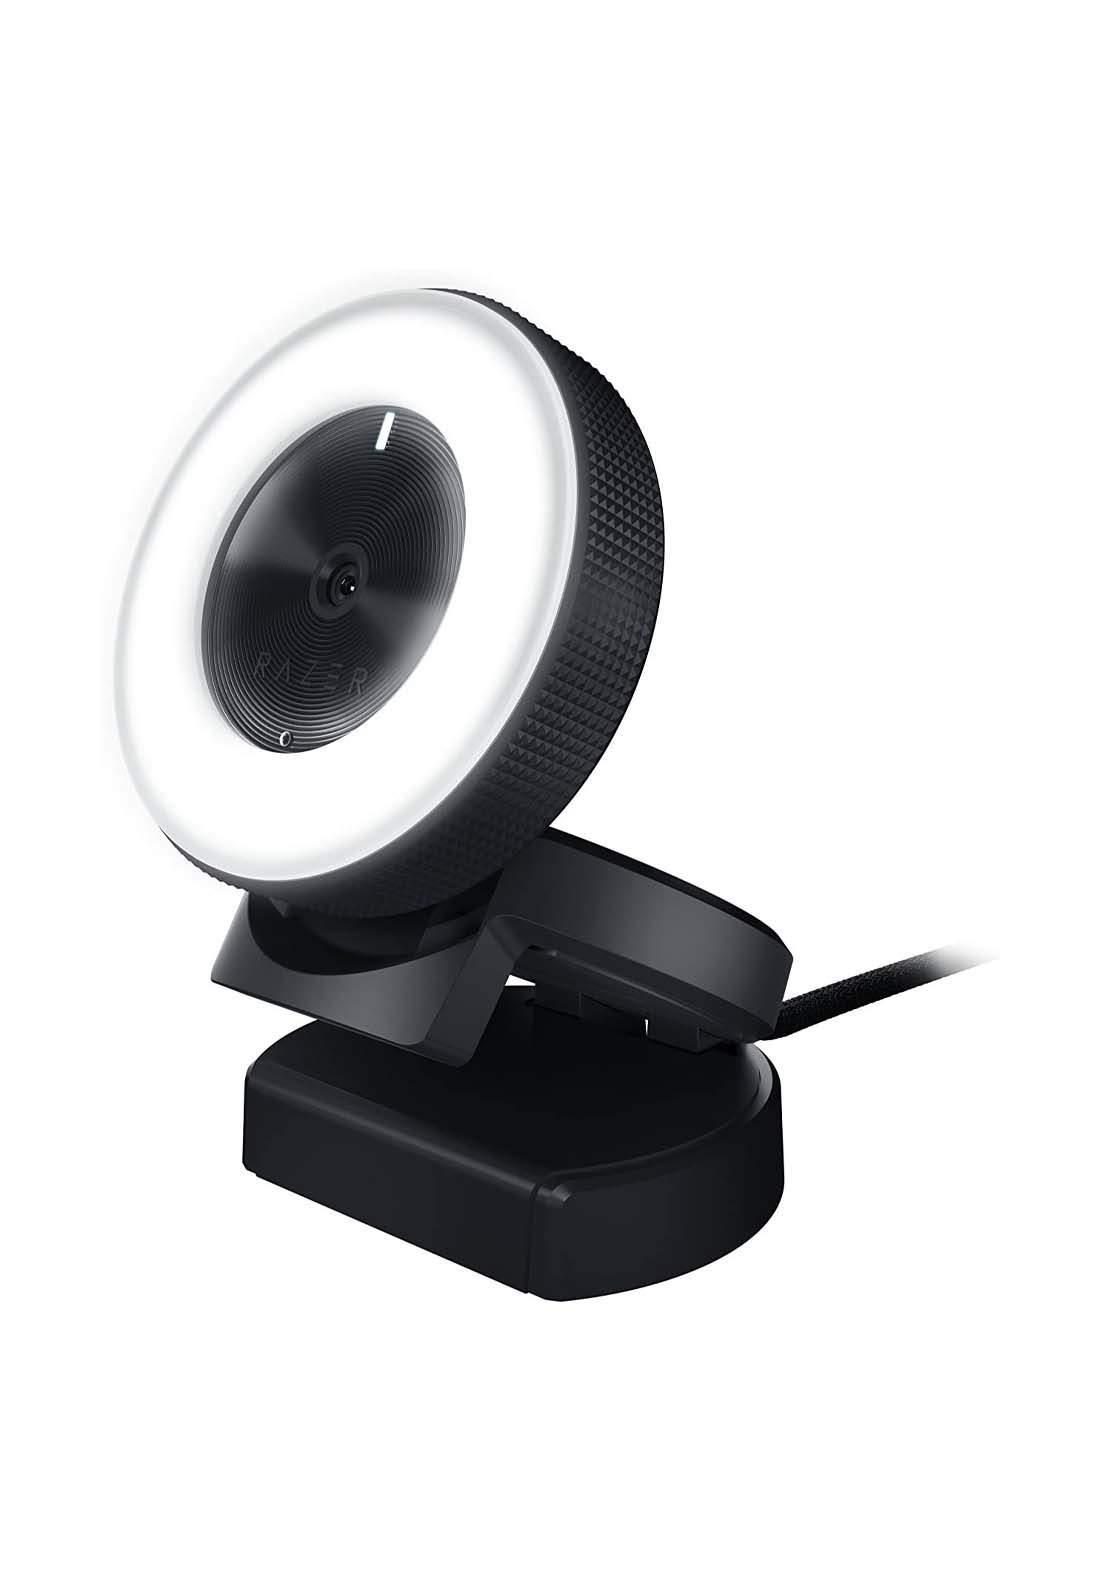 Razer Kiyo Streaming Webcam - Black ??????